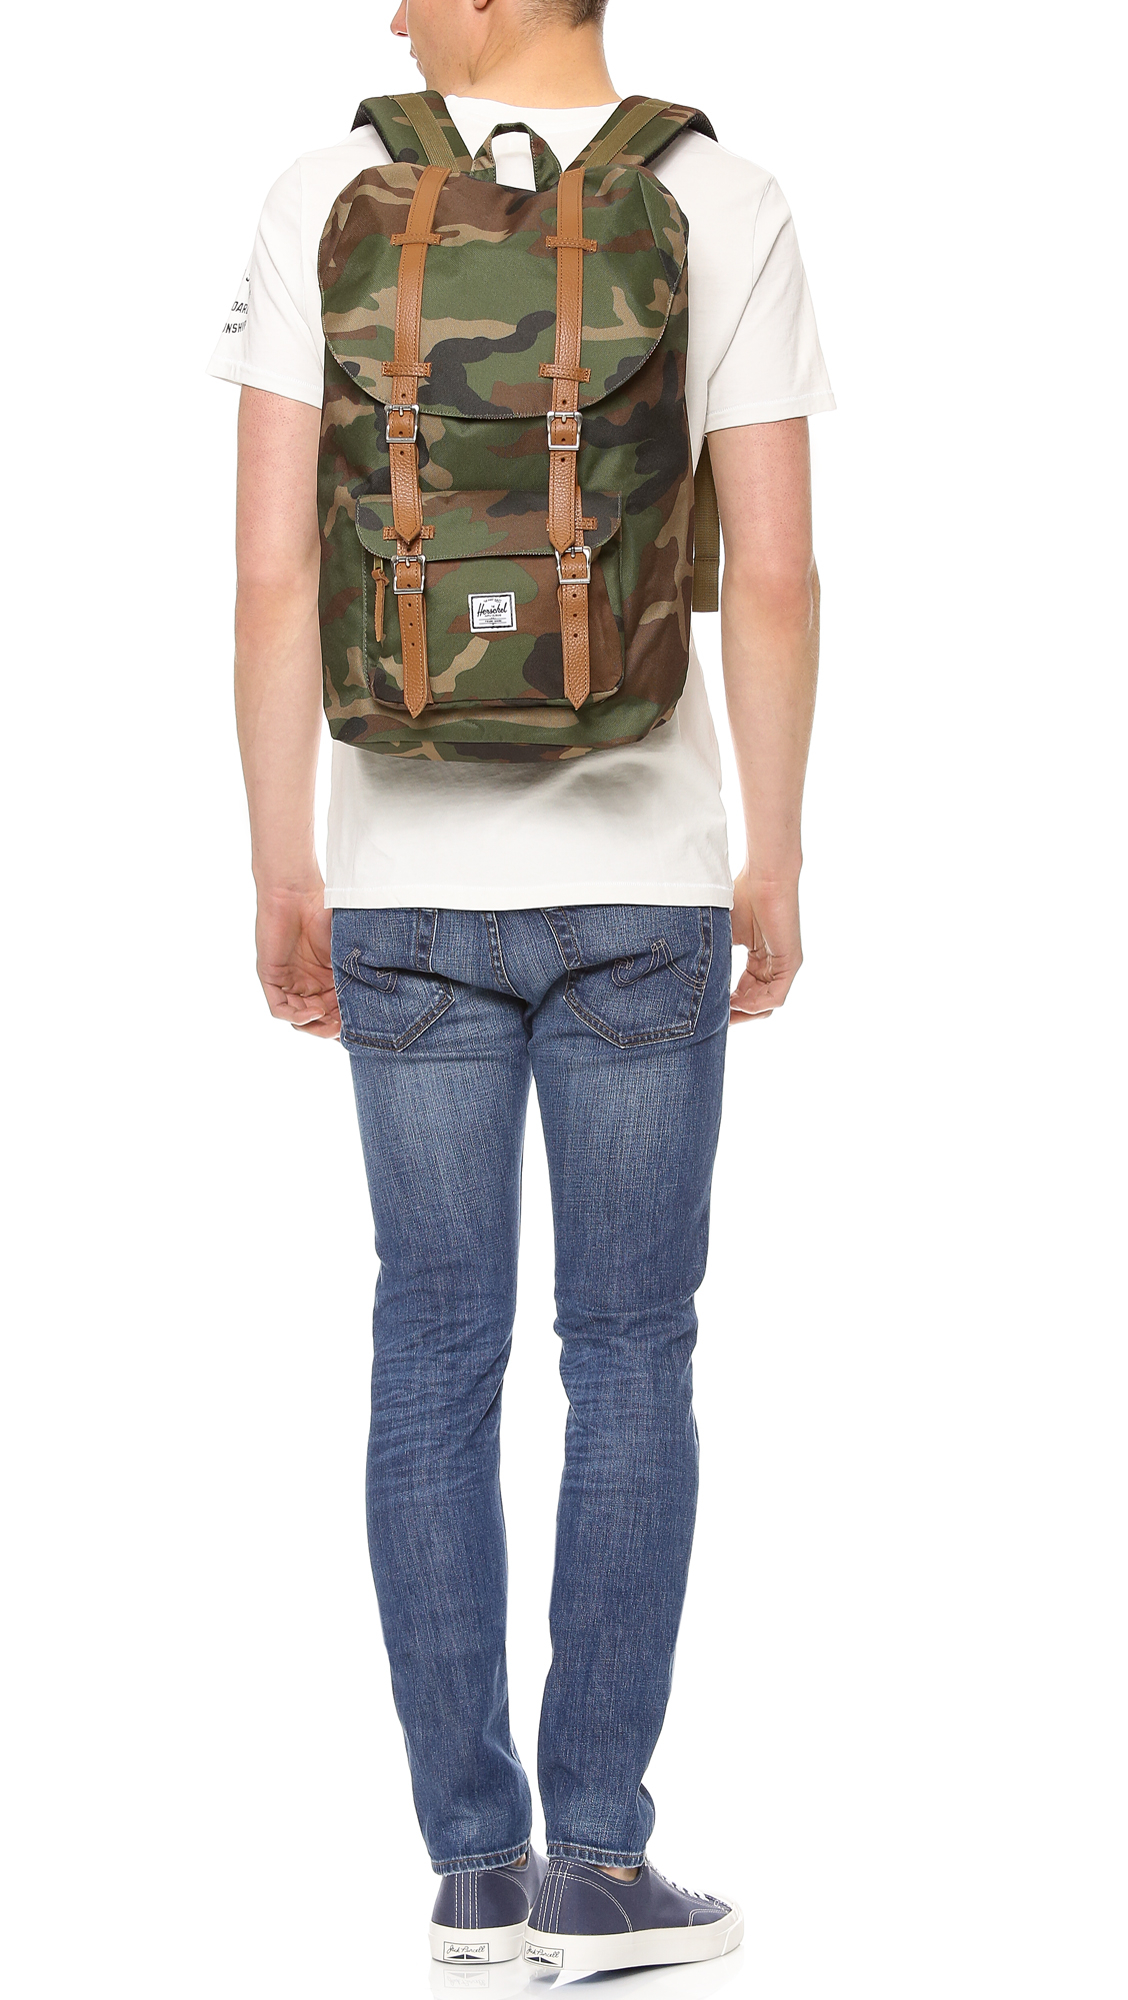 Lyst - Herschel Supply Co. Little America Backpack in Green for Men 80a628098e71e